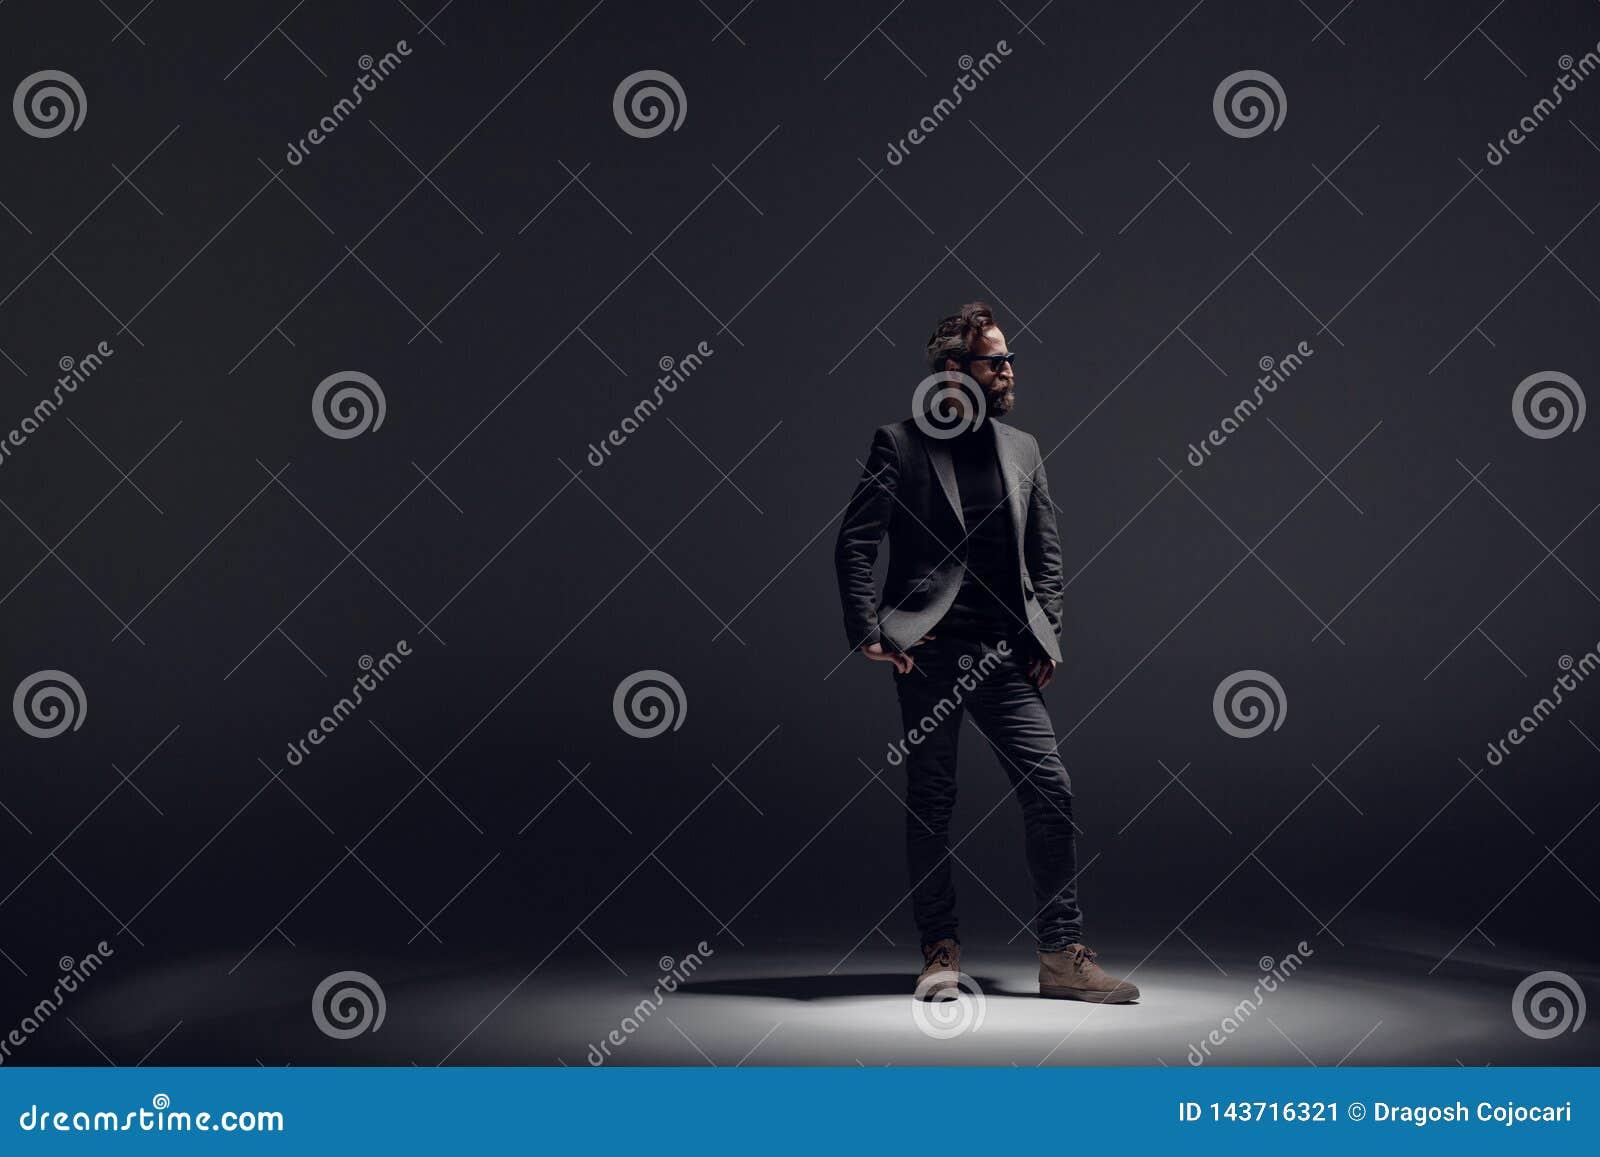 Handsome bearded man wearing in black suit, poses in profile in studio, on a dark lightt background.